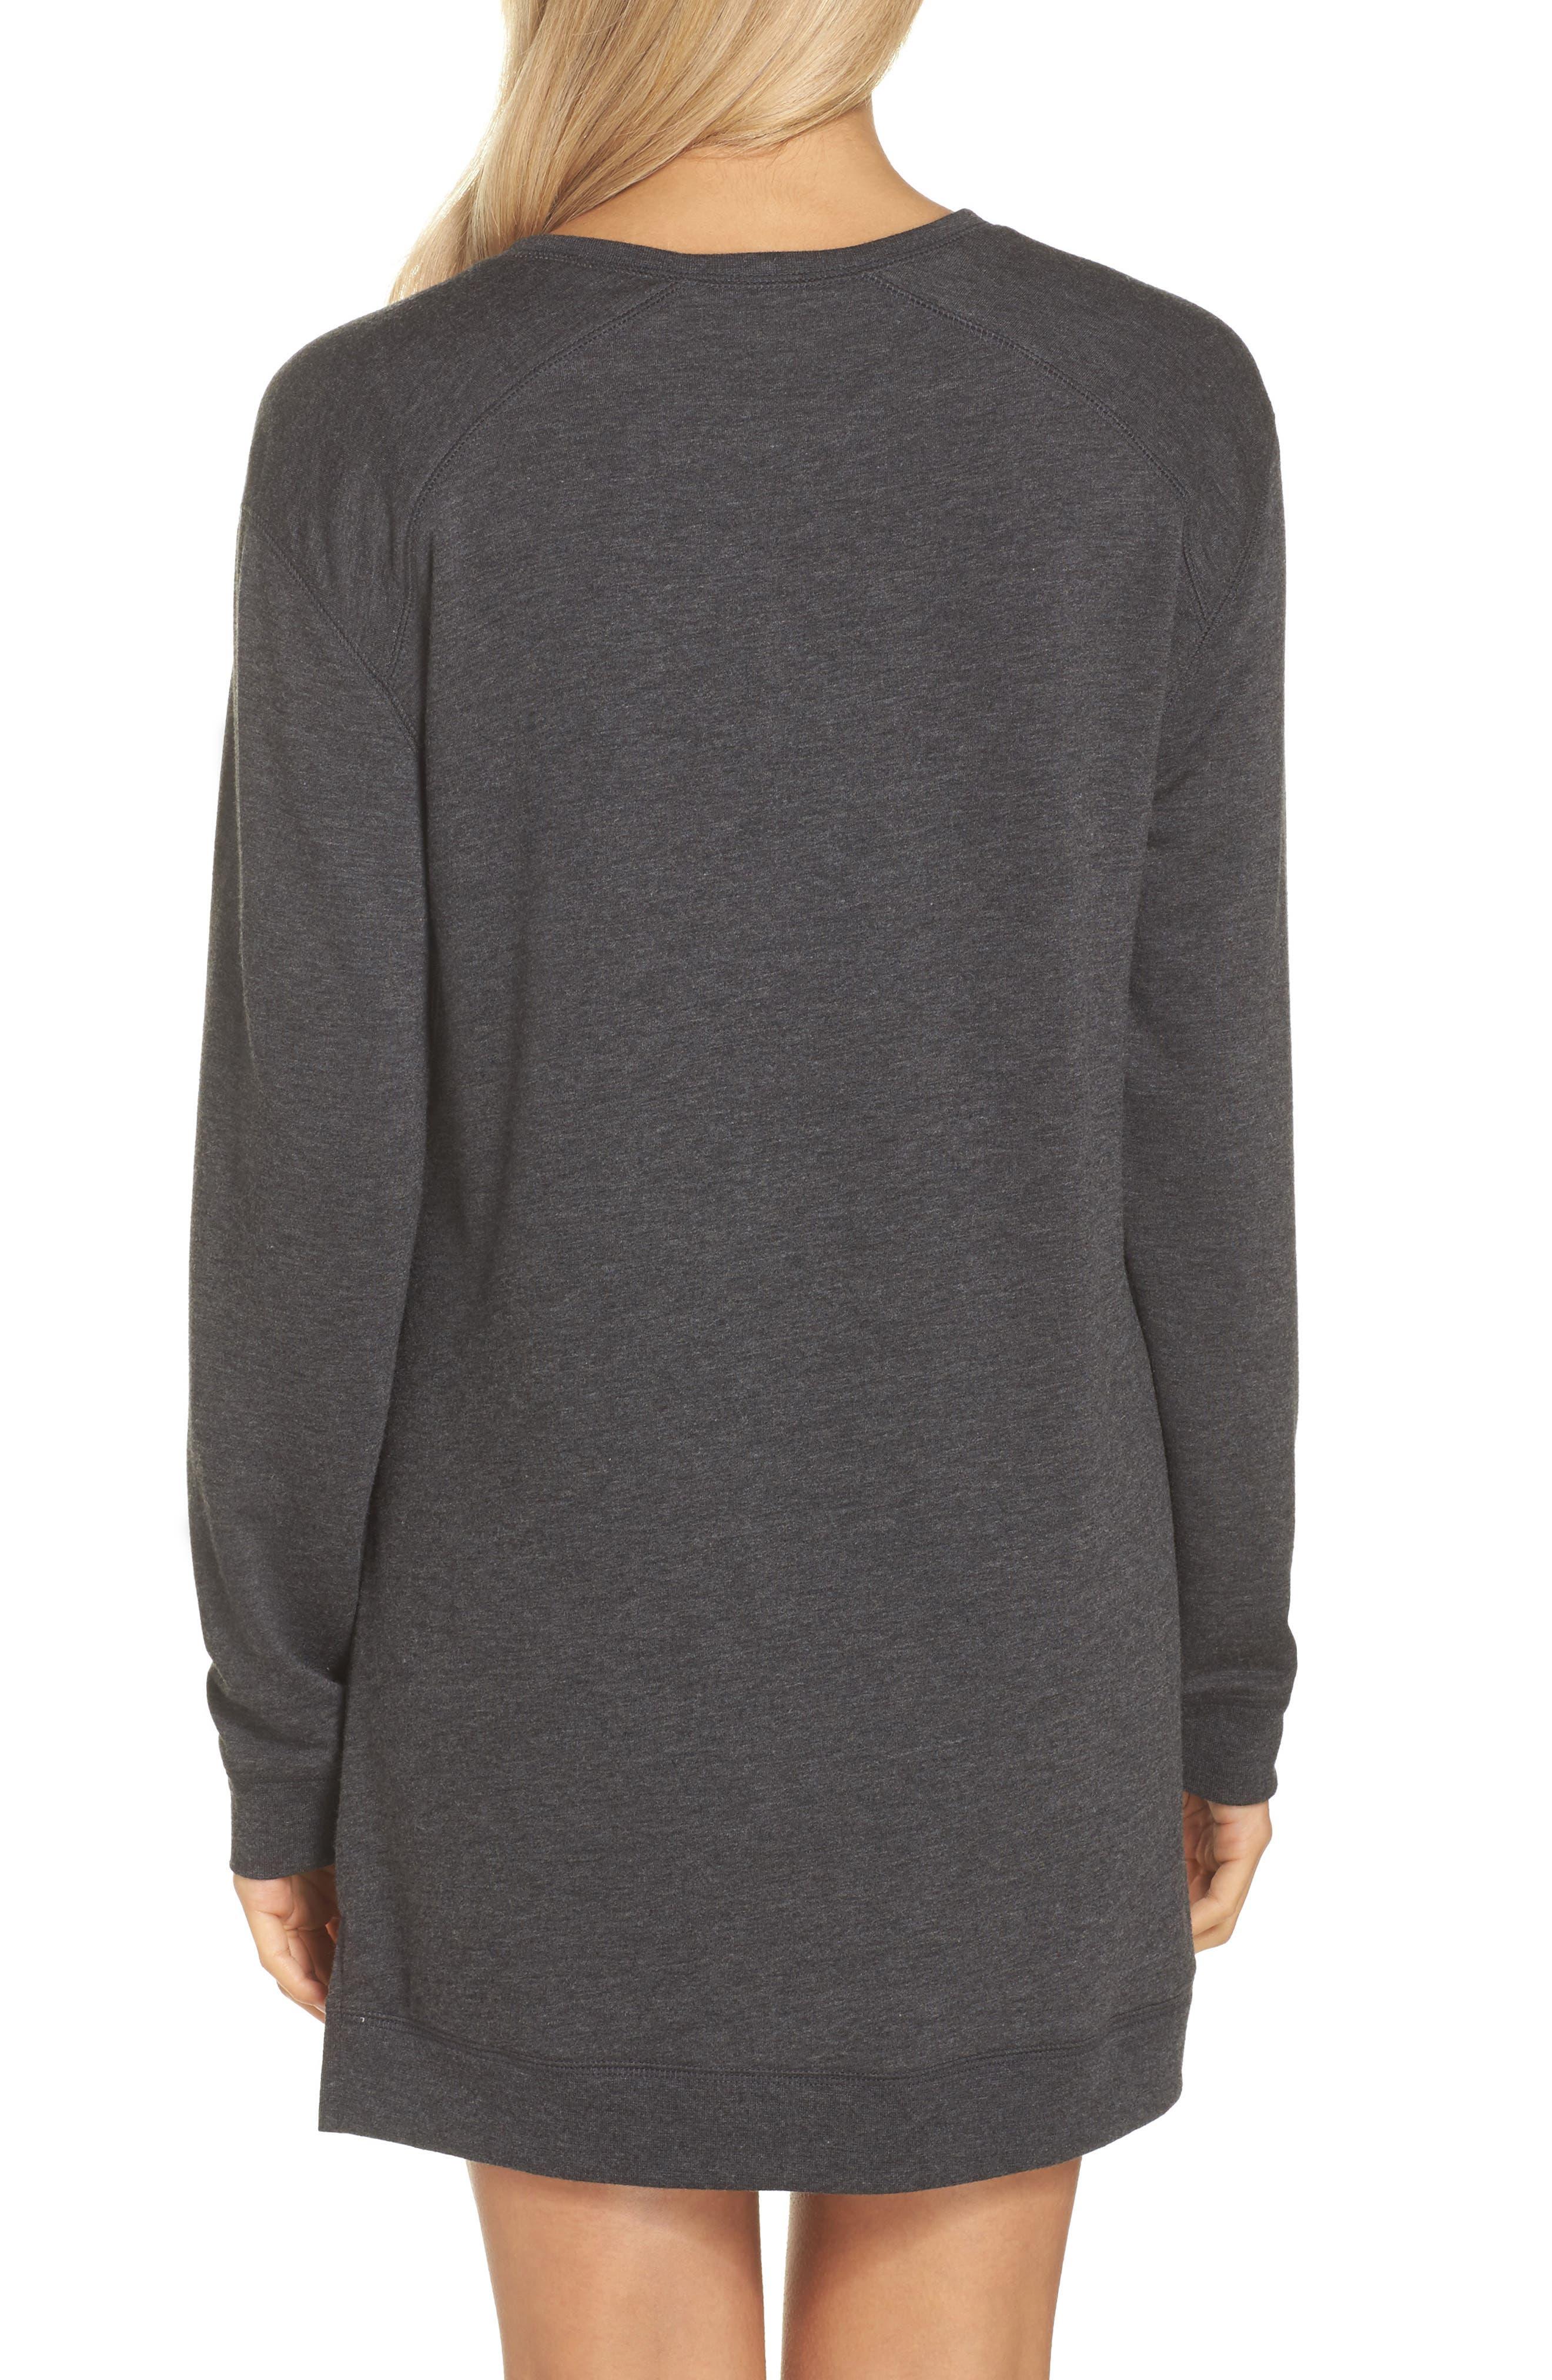 Sleepy Tunic Shirt,                             Alternate thumbnail 2, color,                             Grey Wolf Heather